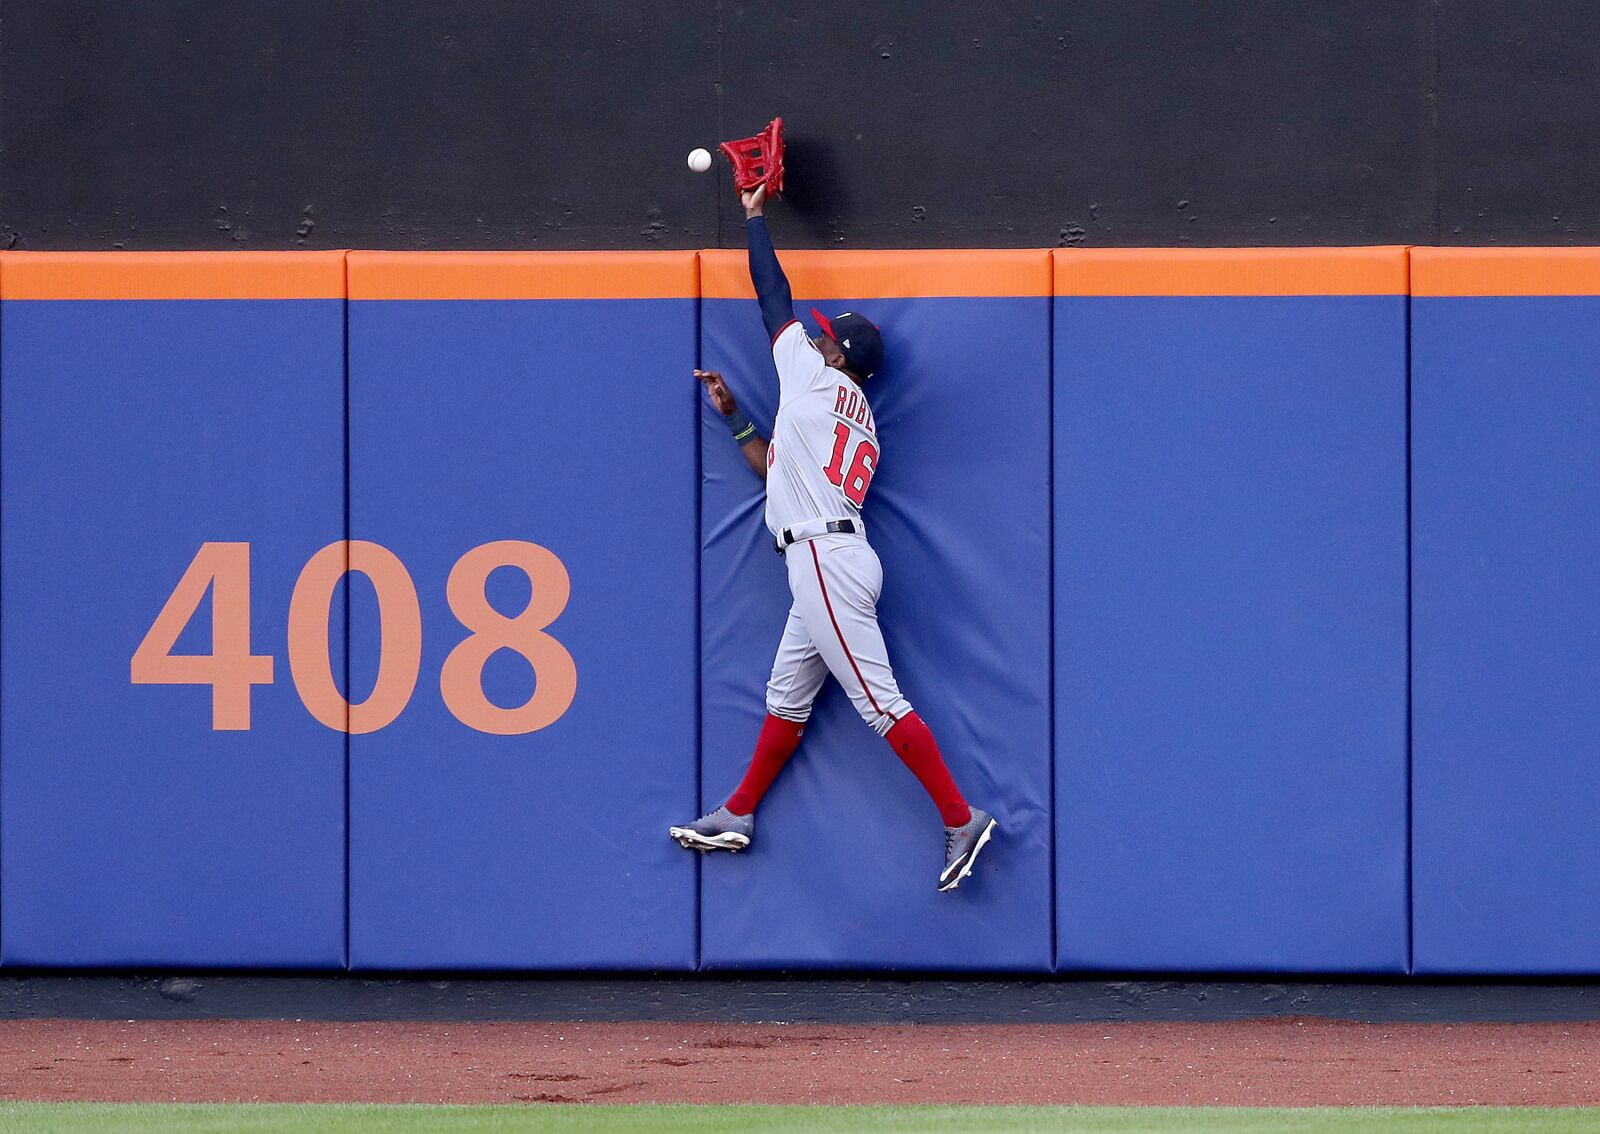 Oklahoma baseball: Sooners begin at bottom in their Big 12 Championship bracket